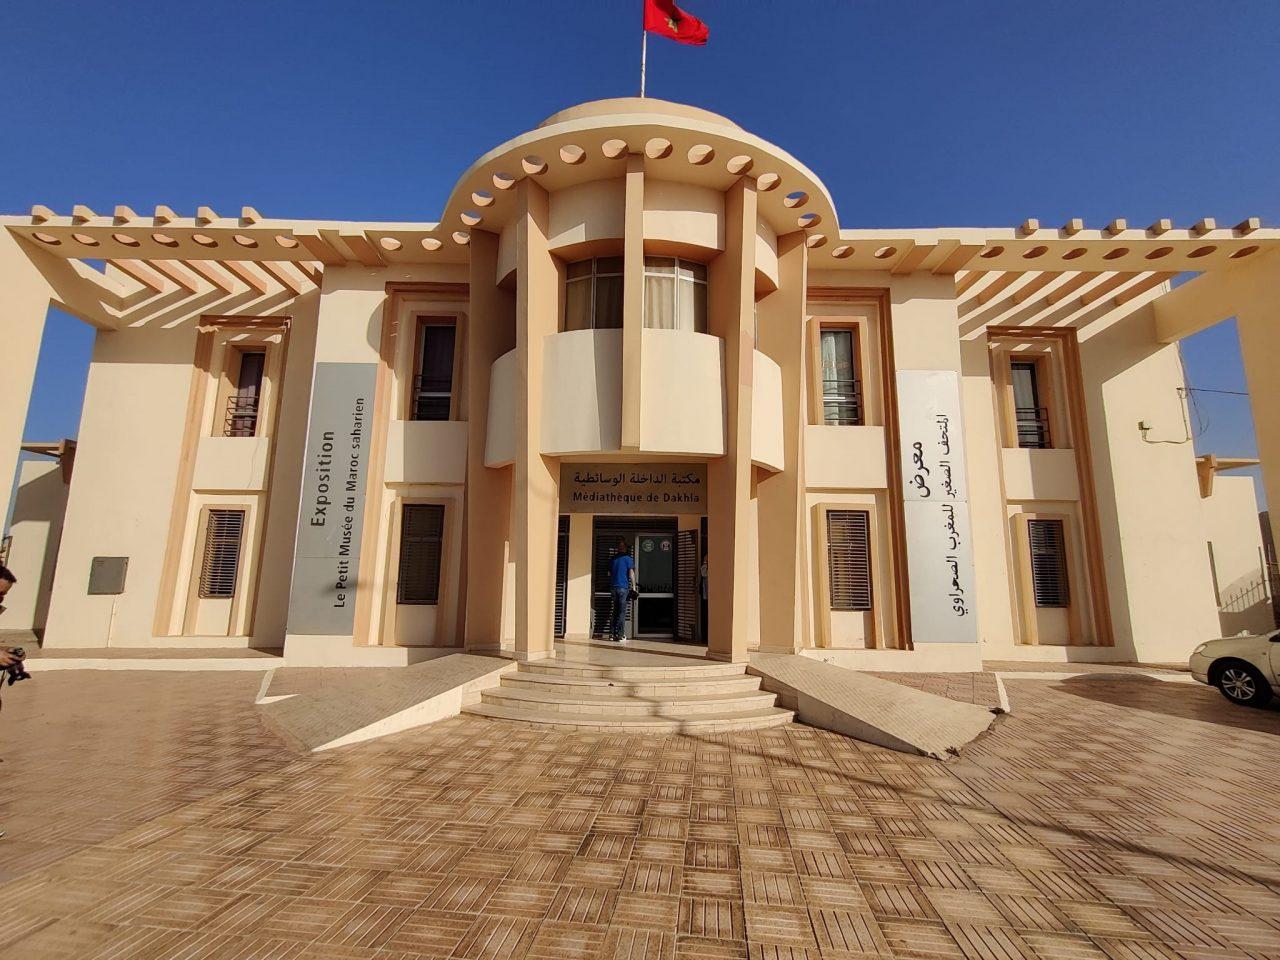 Mediateca Dakhla